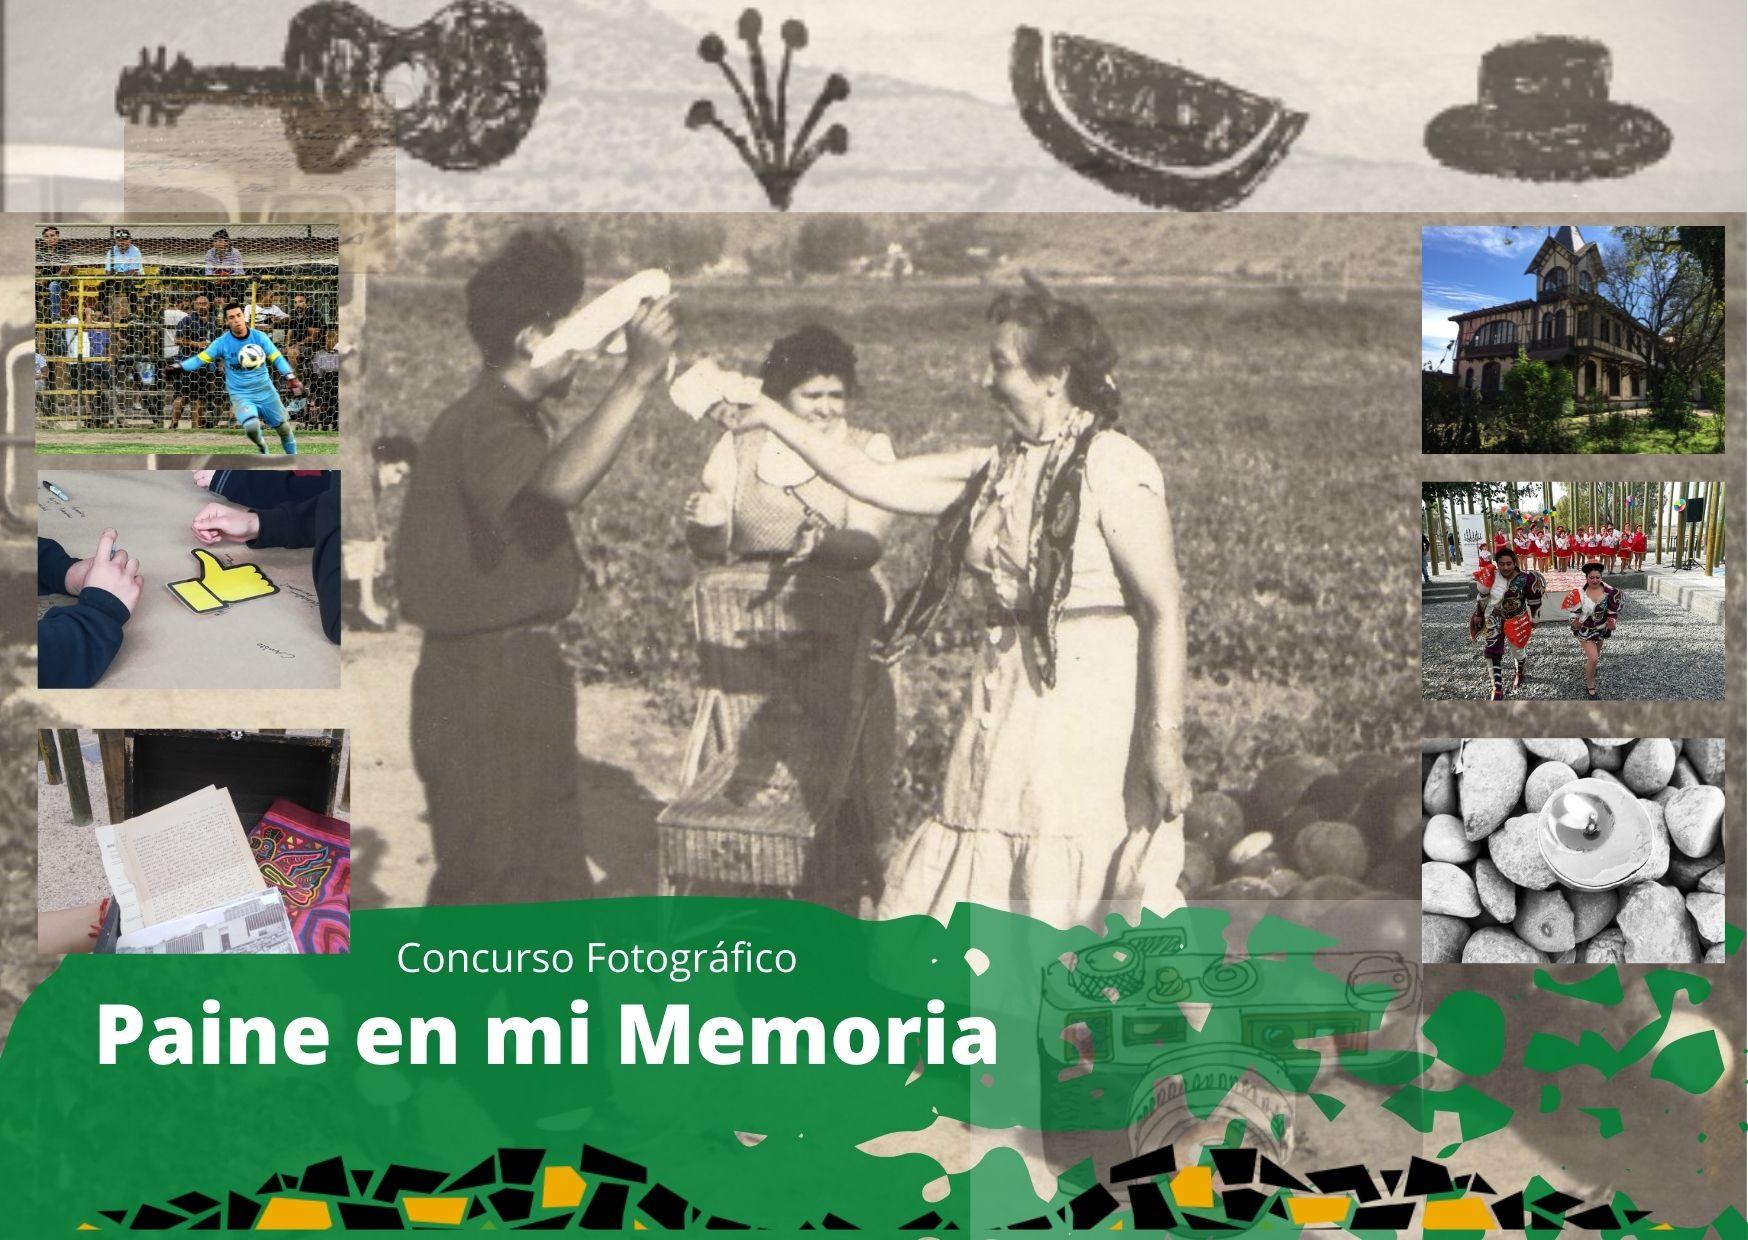 Memorial Paine abre convocatoria a concurso de fotografía para estudiantes